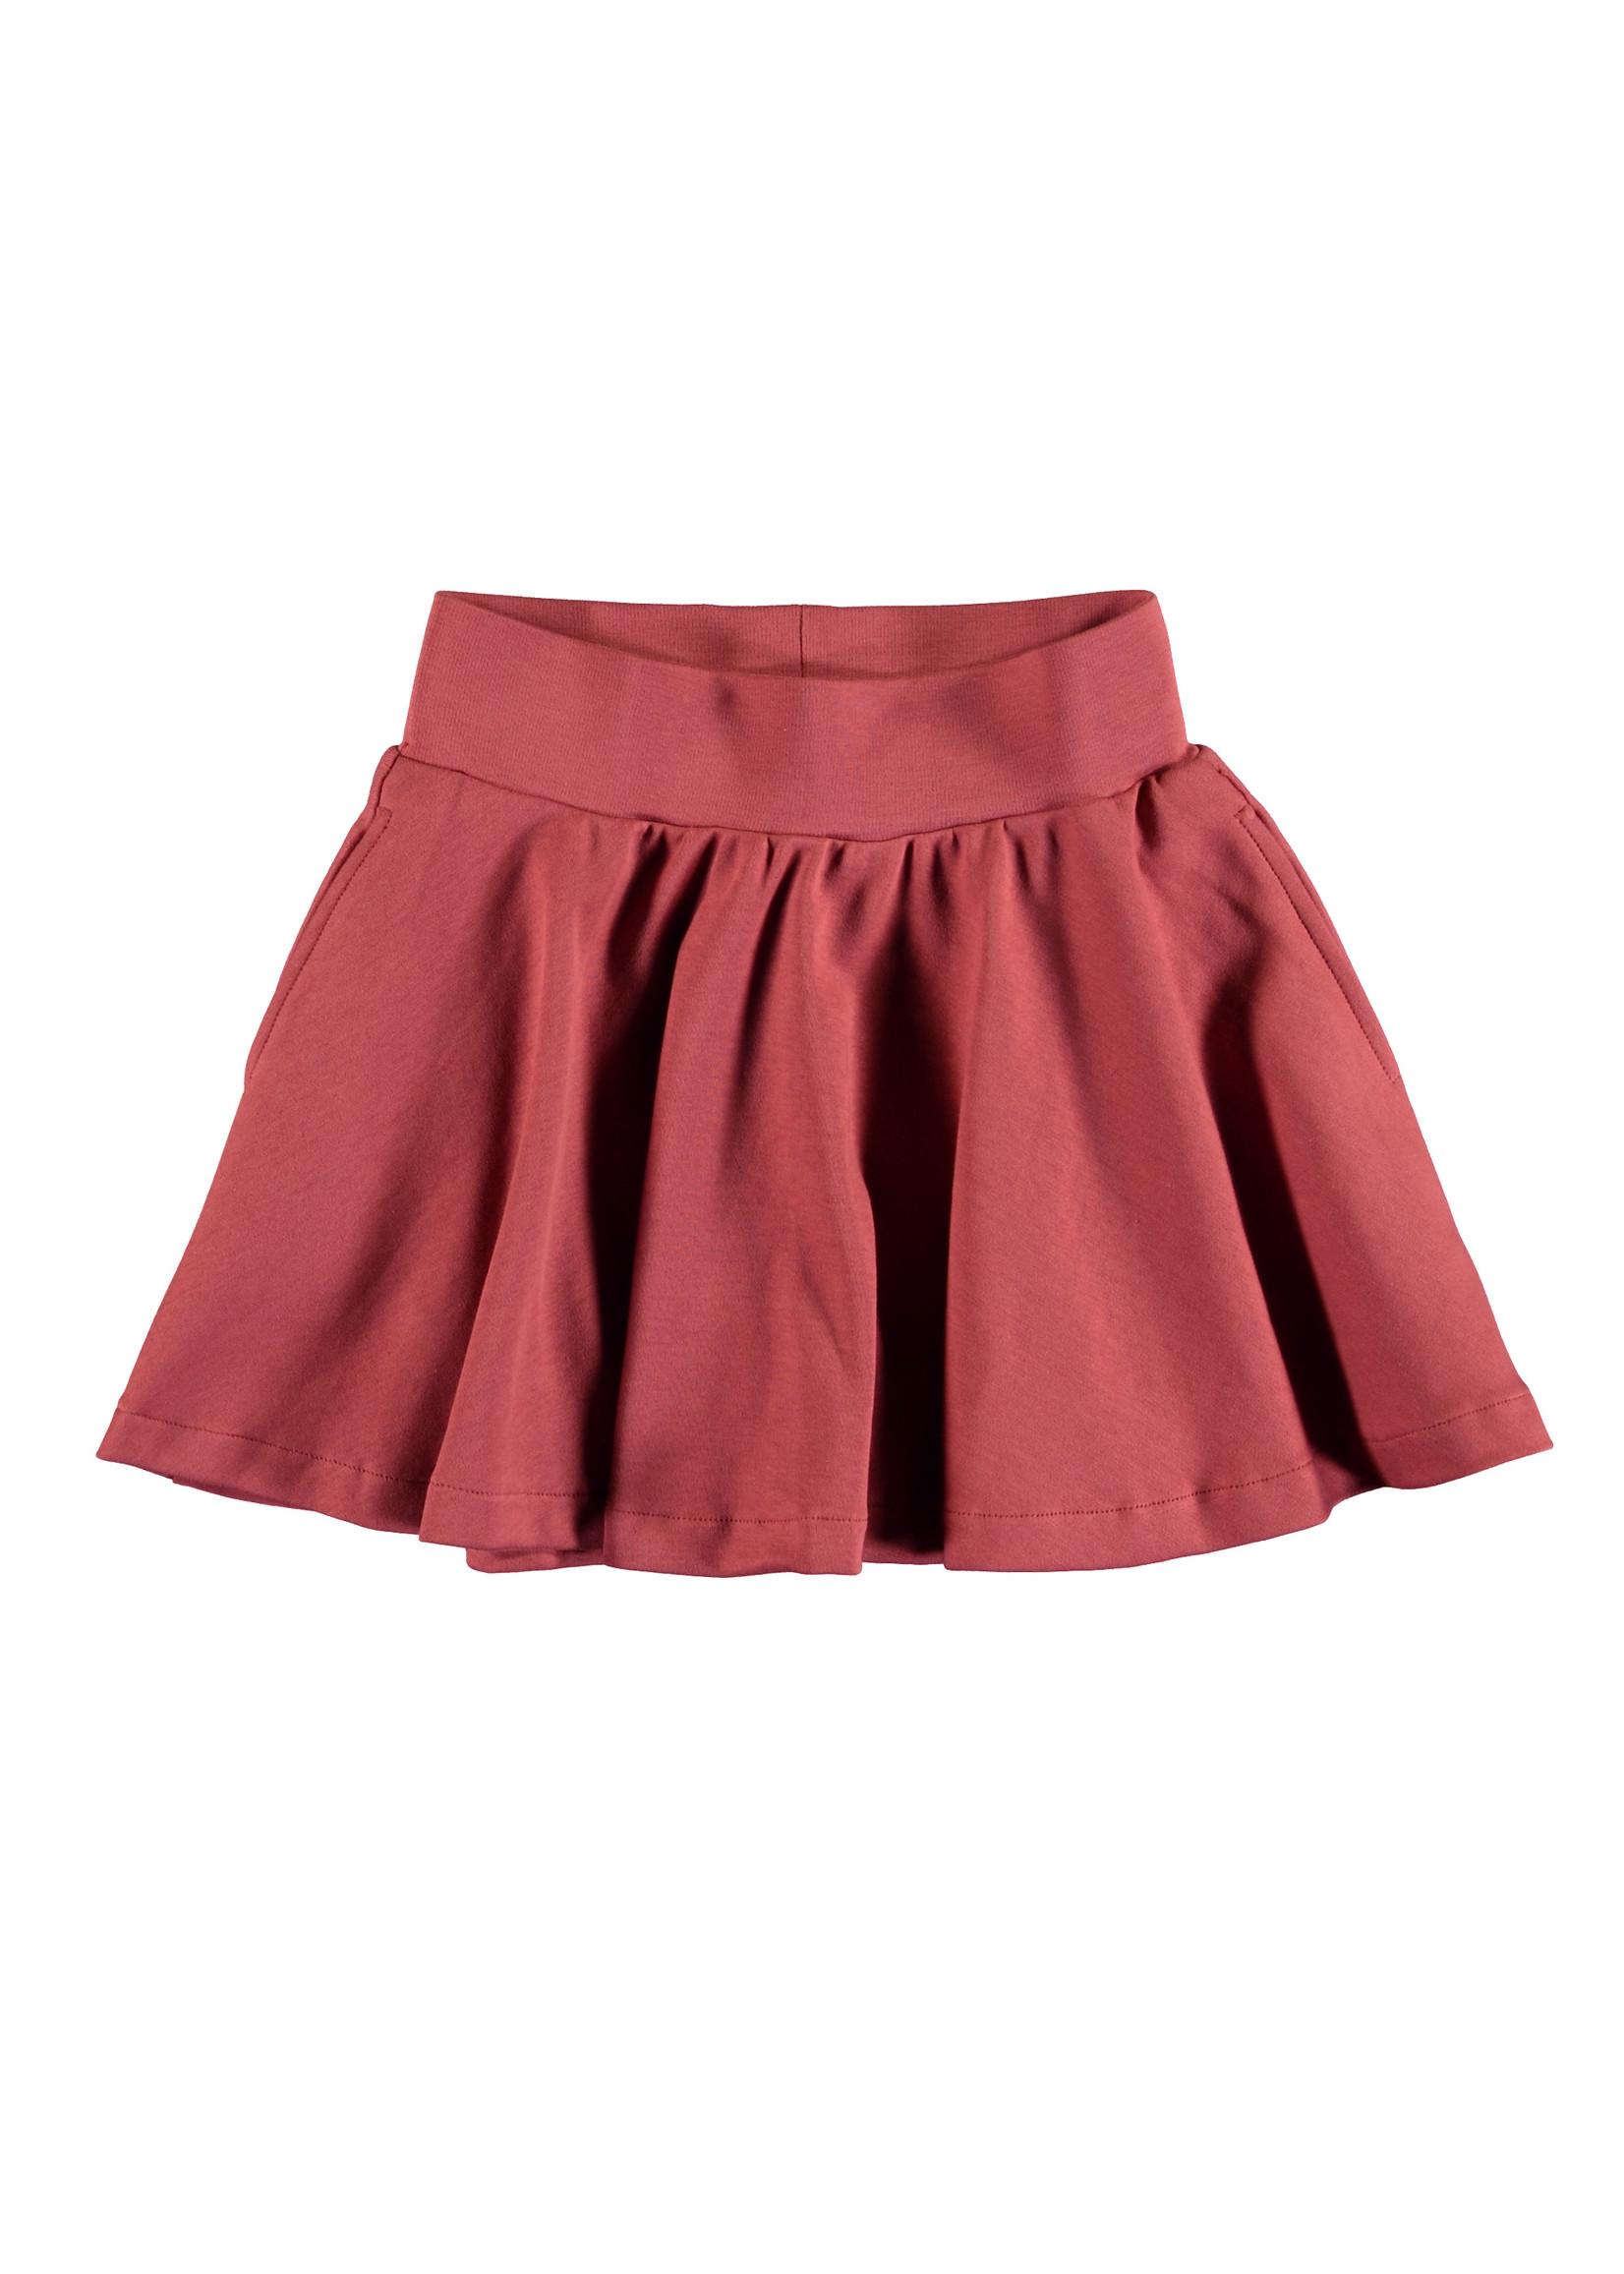 Pexi Lexi PL - Skirt - Marsala